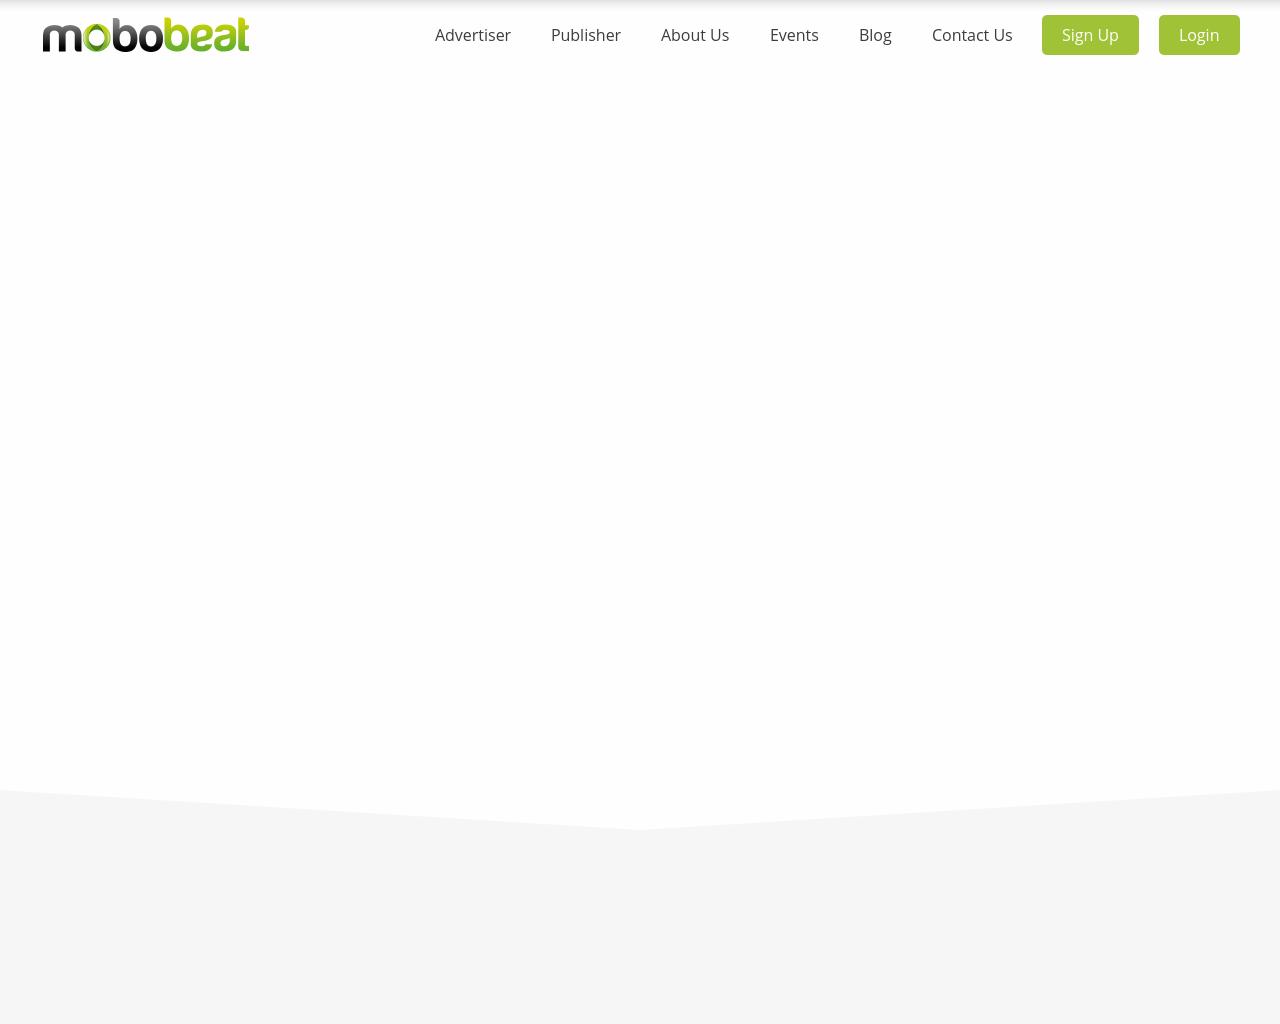 Mobobeat-Advertising-Reviews-Pricing